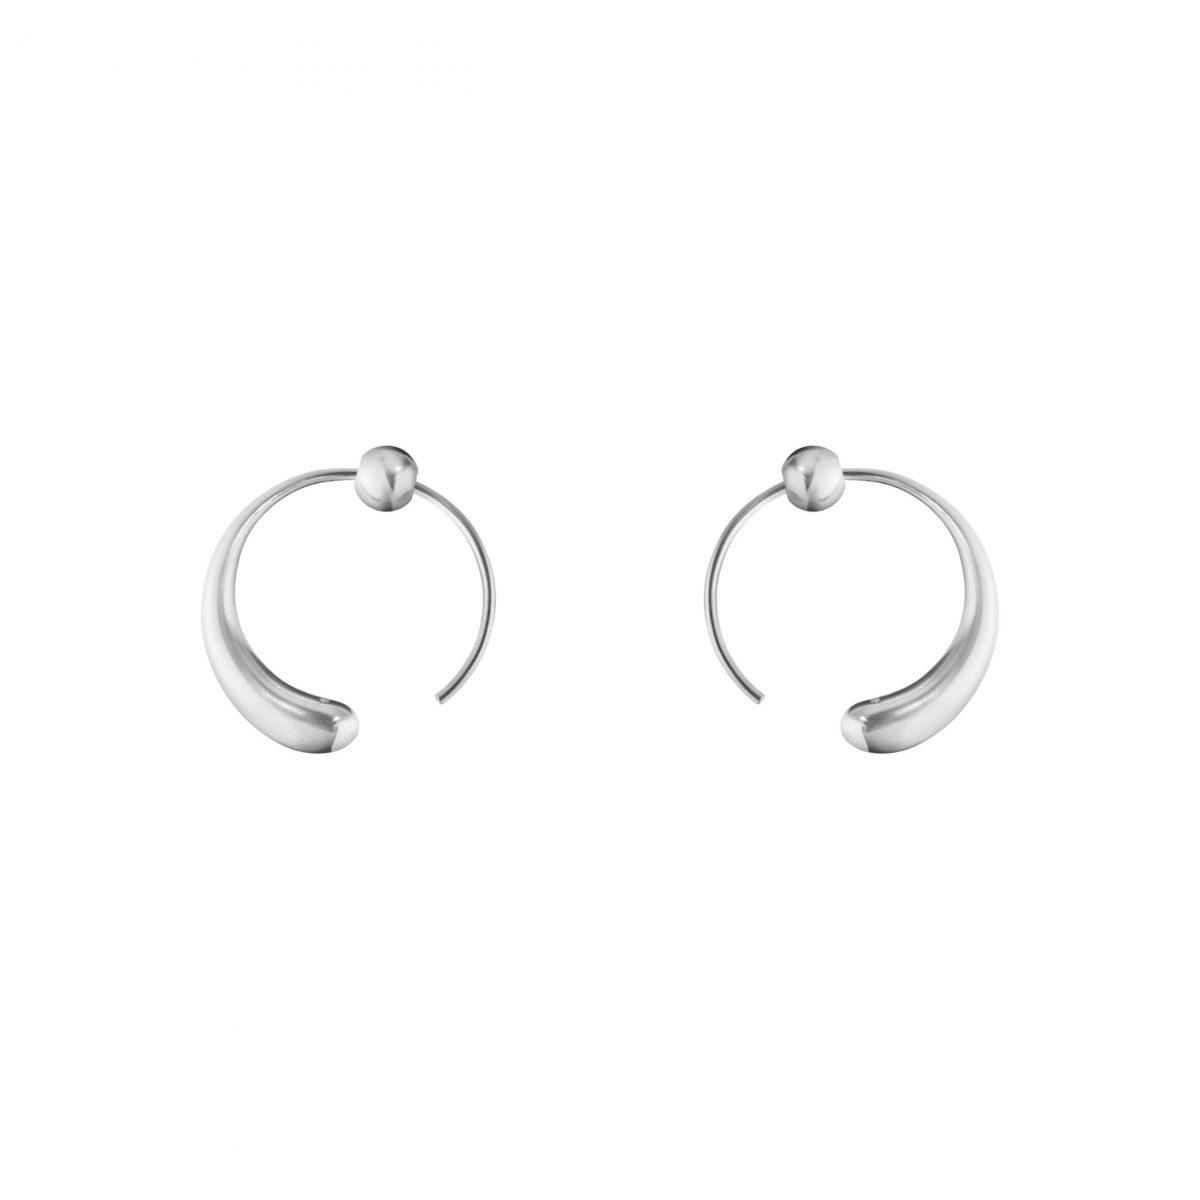 Georg Jensen Mercy Hoop Earrings